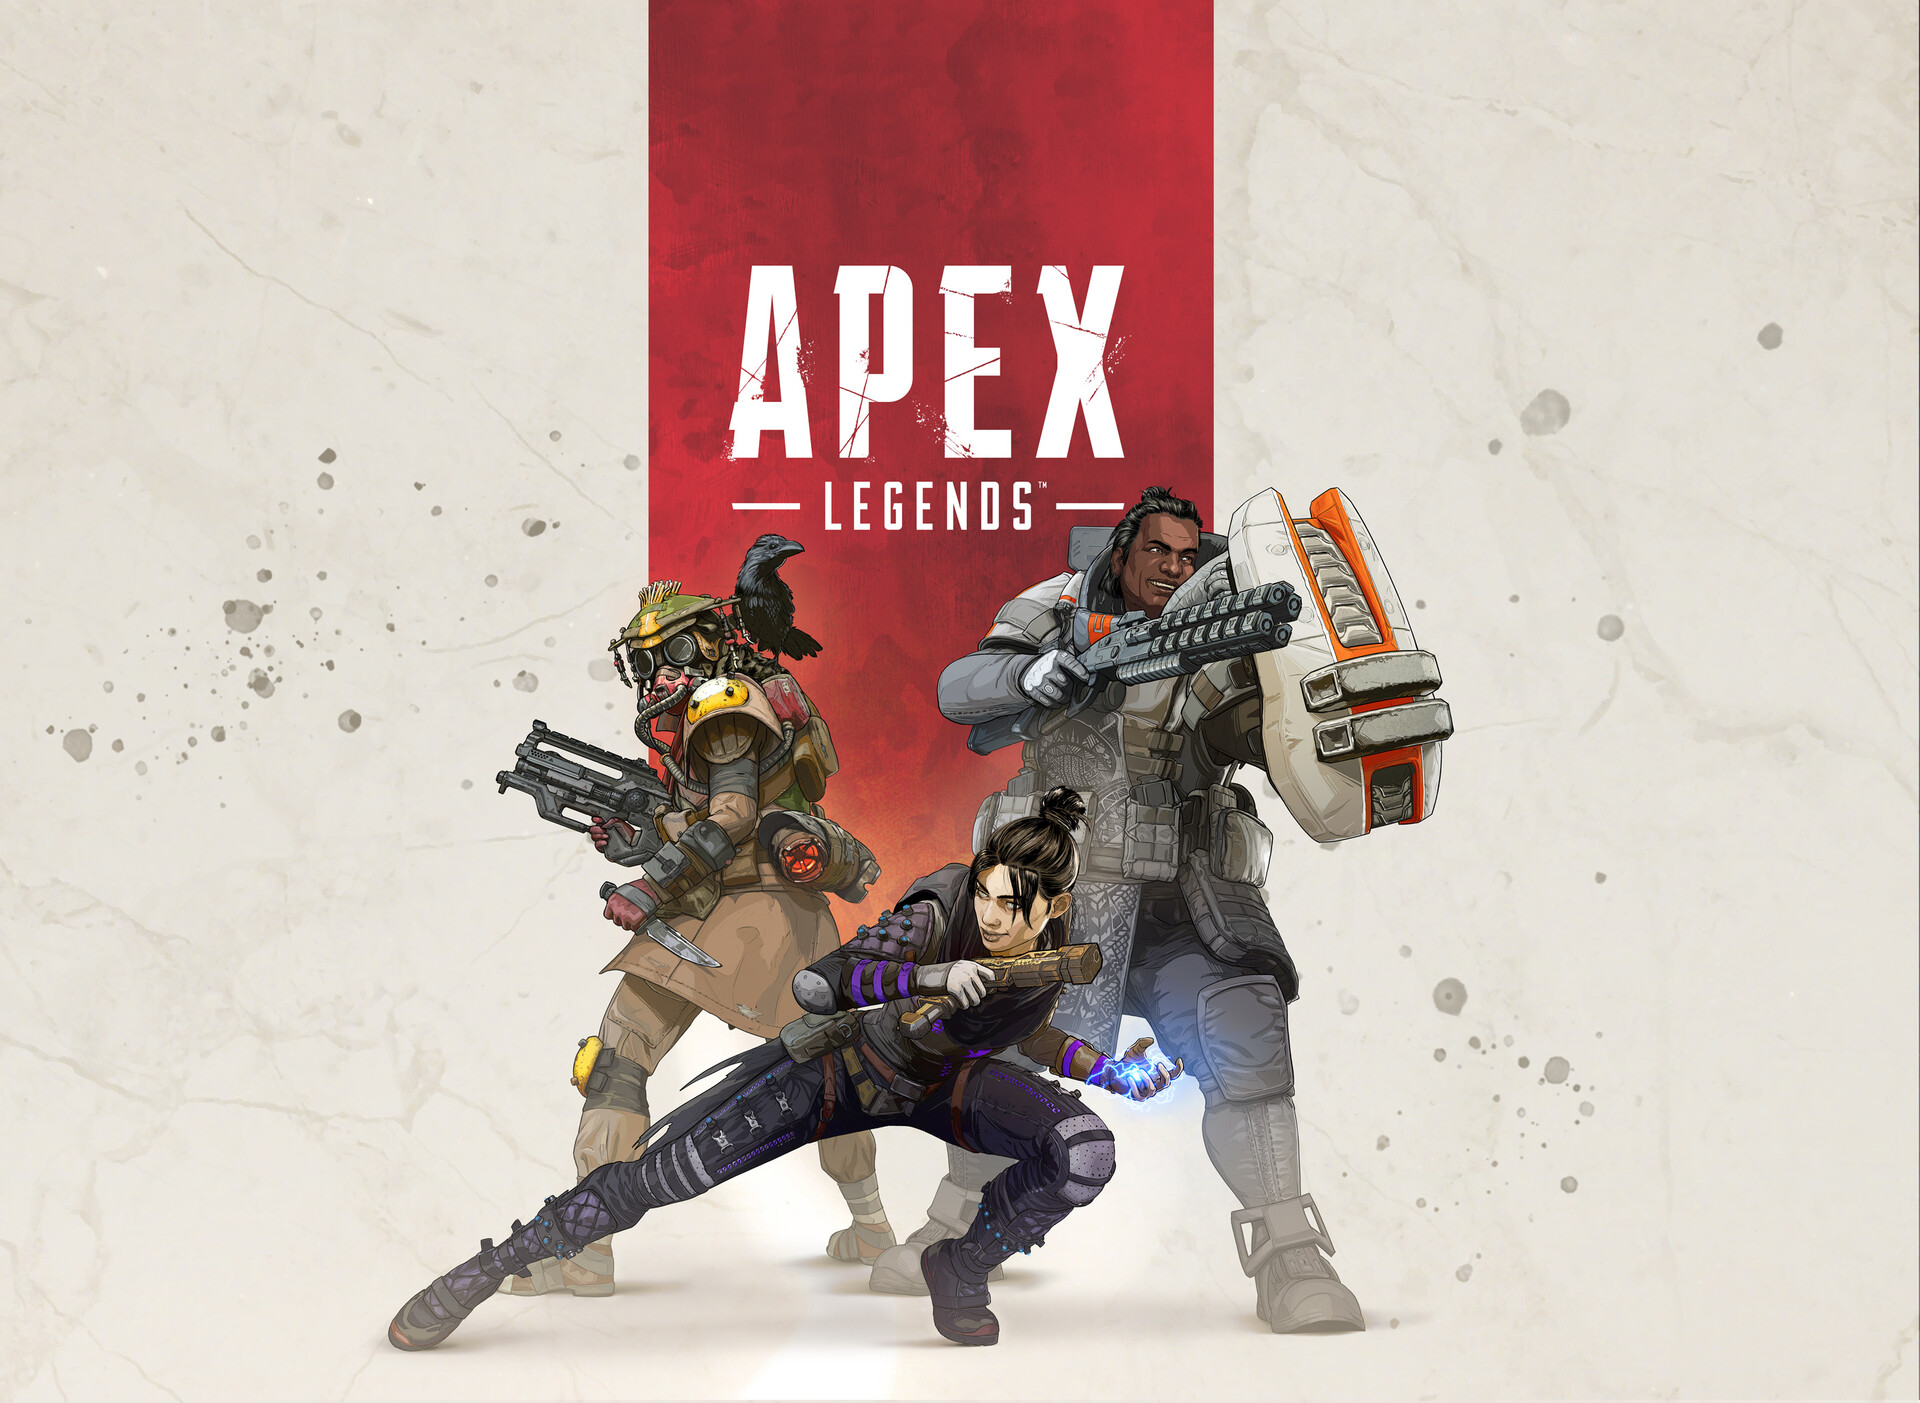 autumn-rain-turkel-apex-legends-boxart.jpg